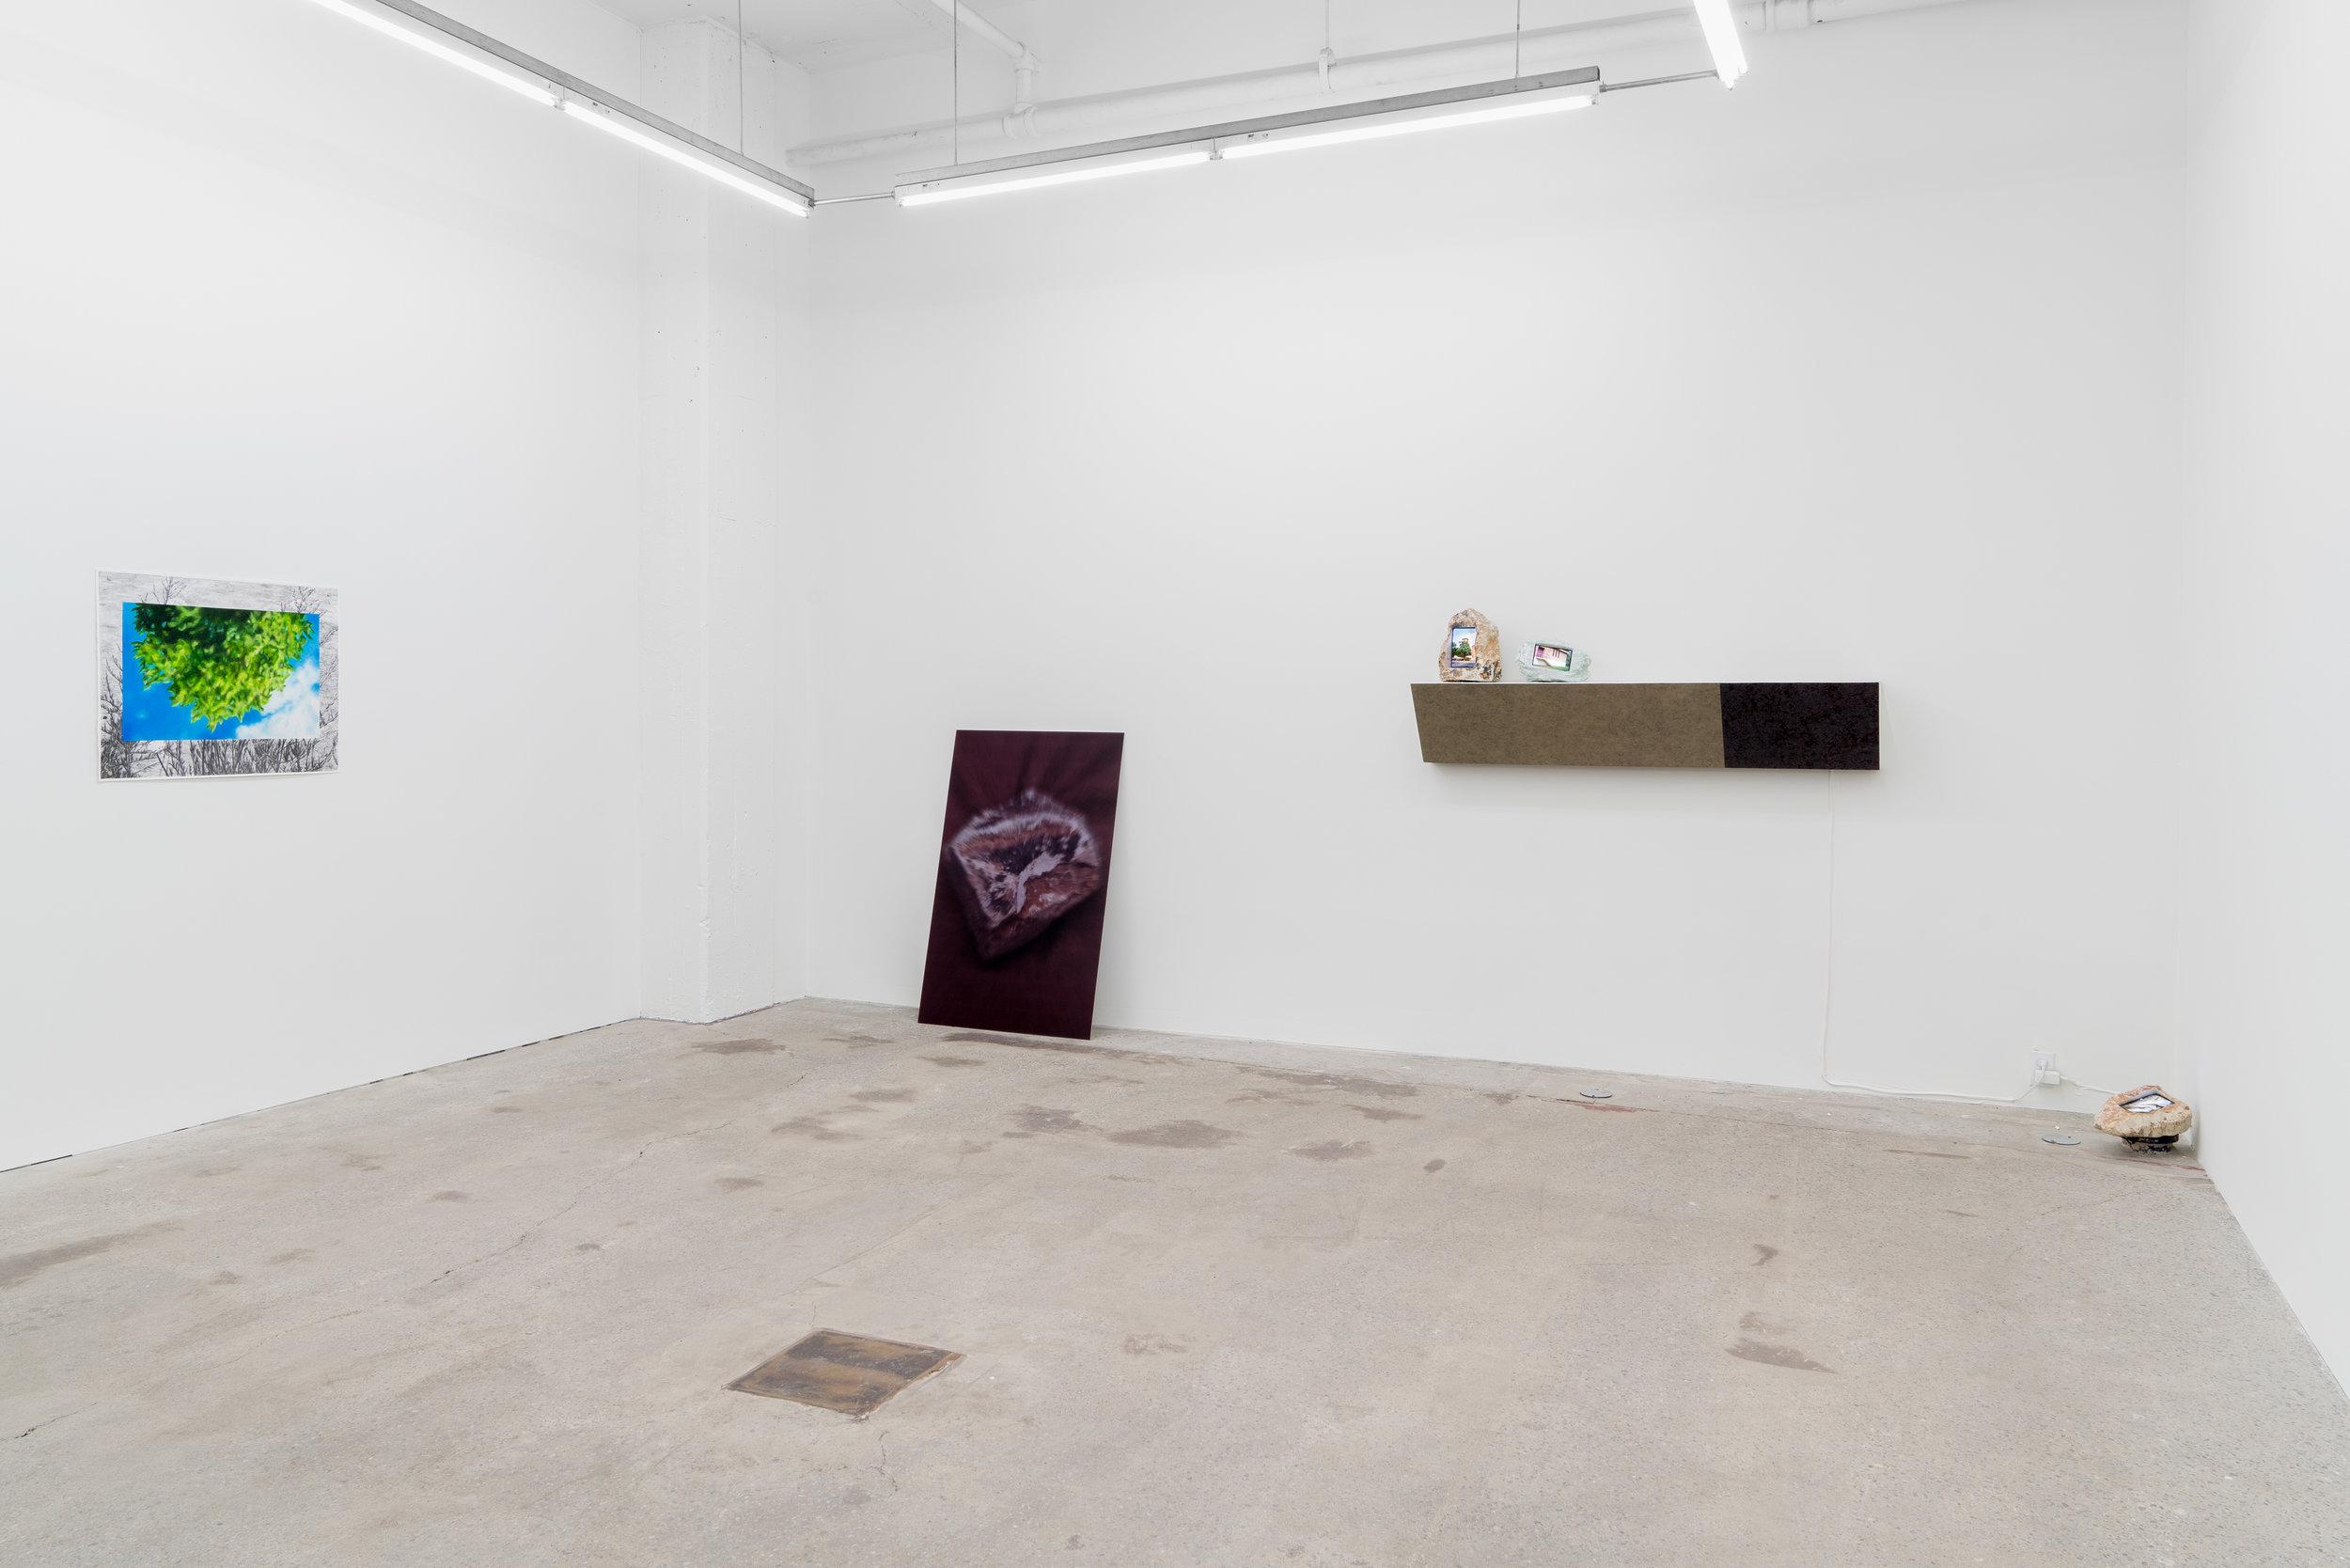 GalerieNicolasRobertNovembre2018 (11 of 27).jpg